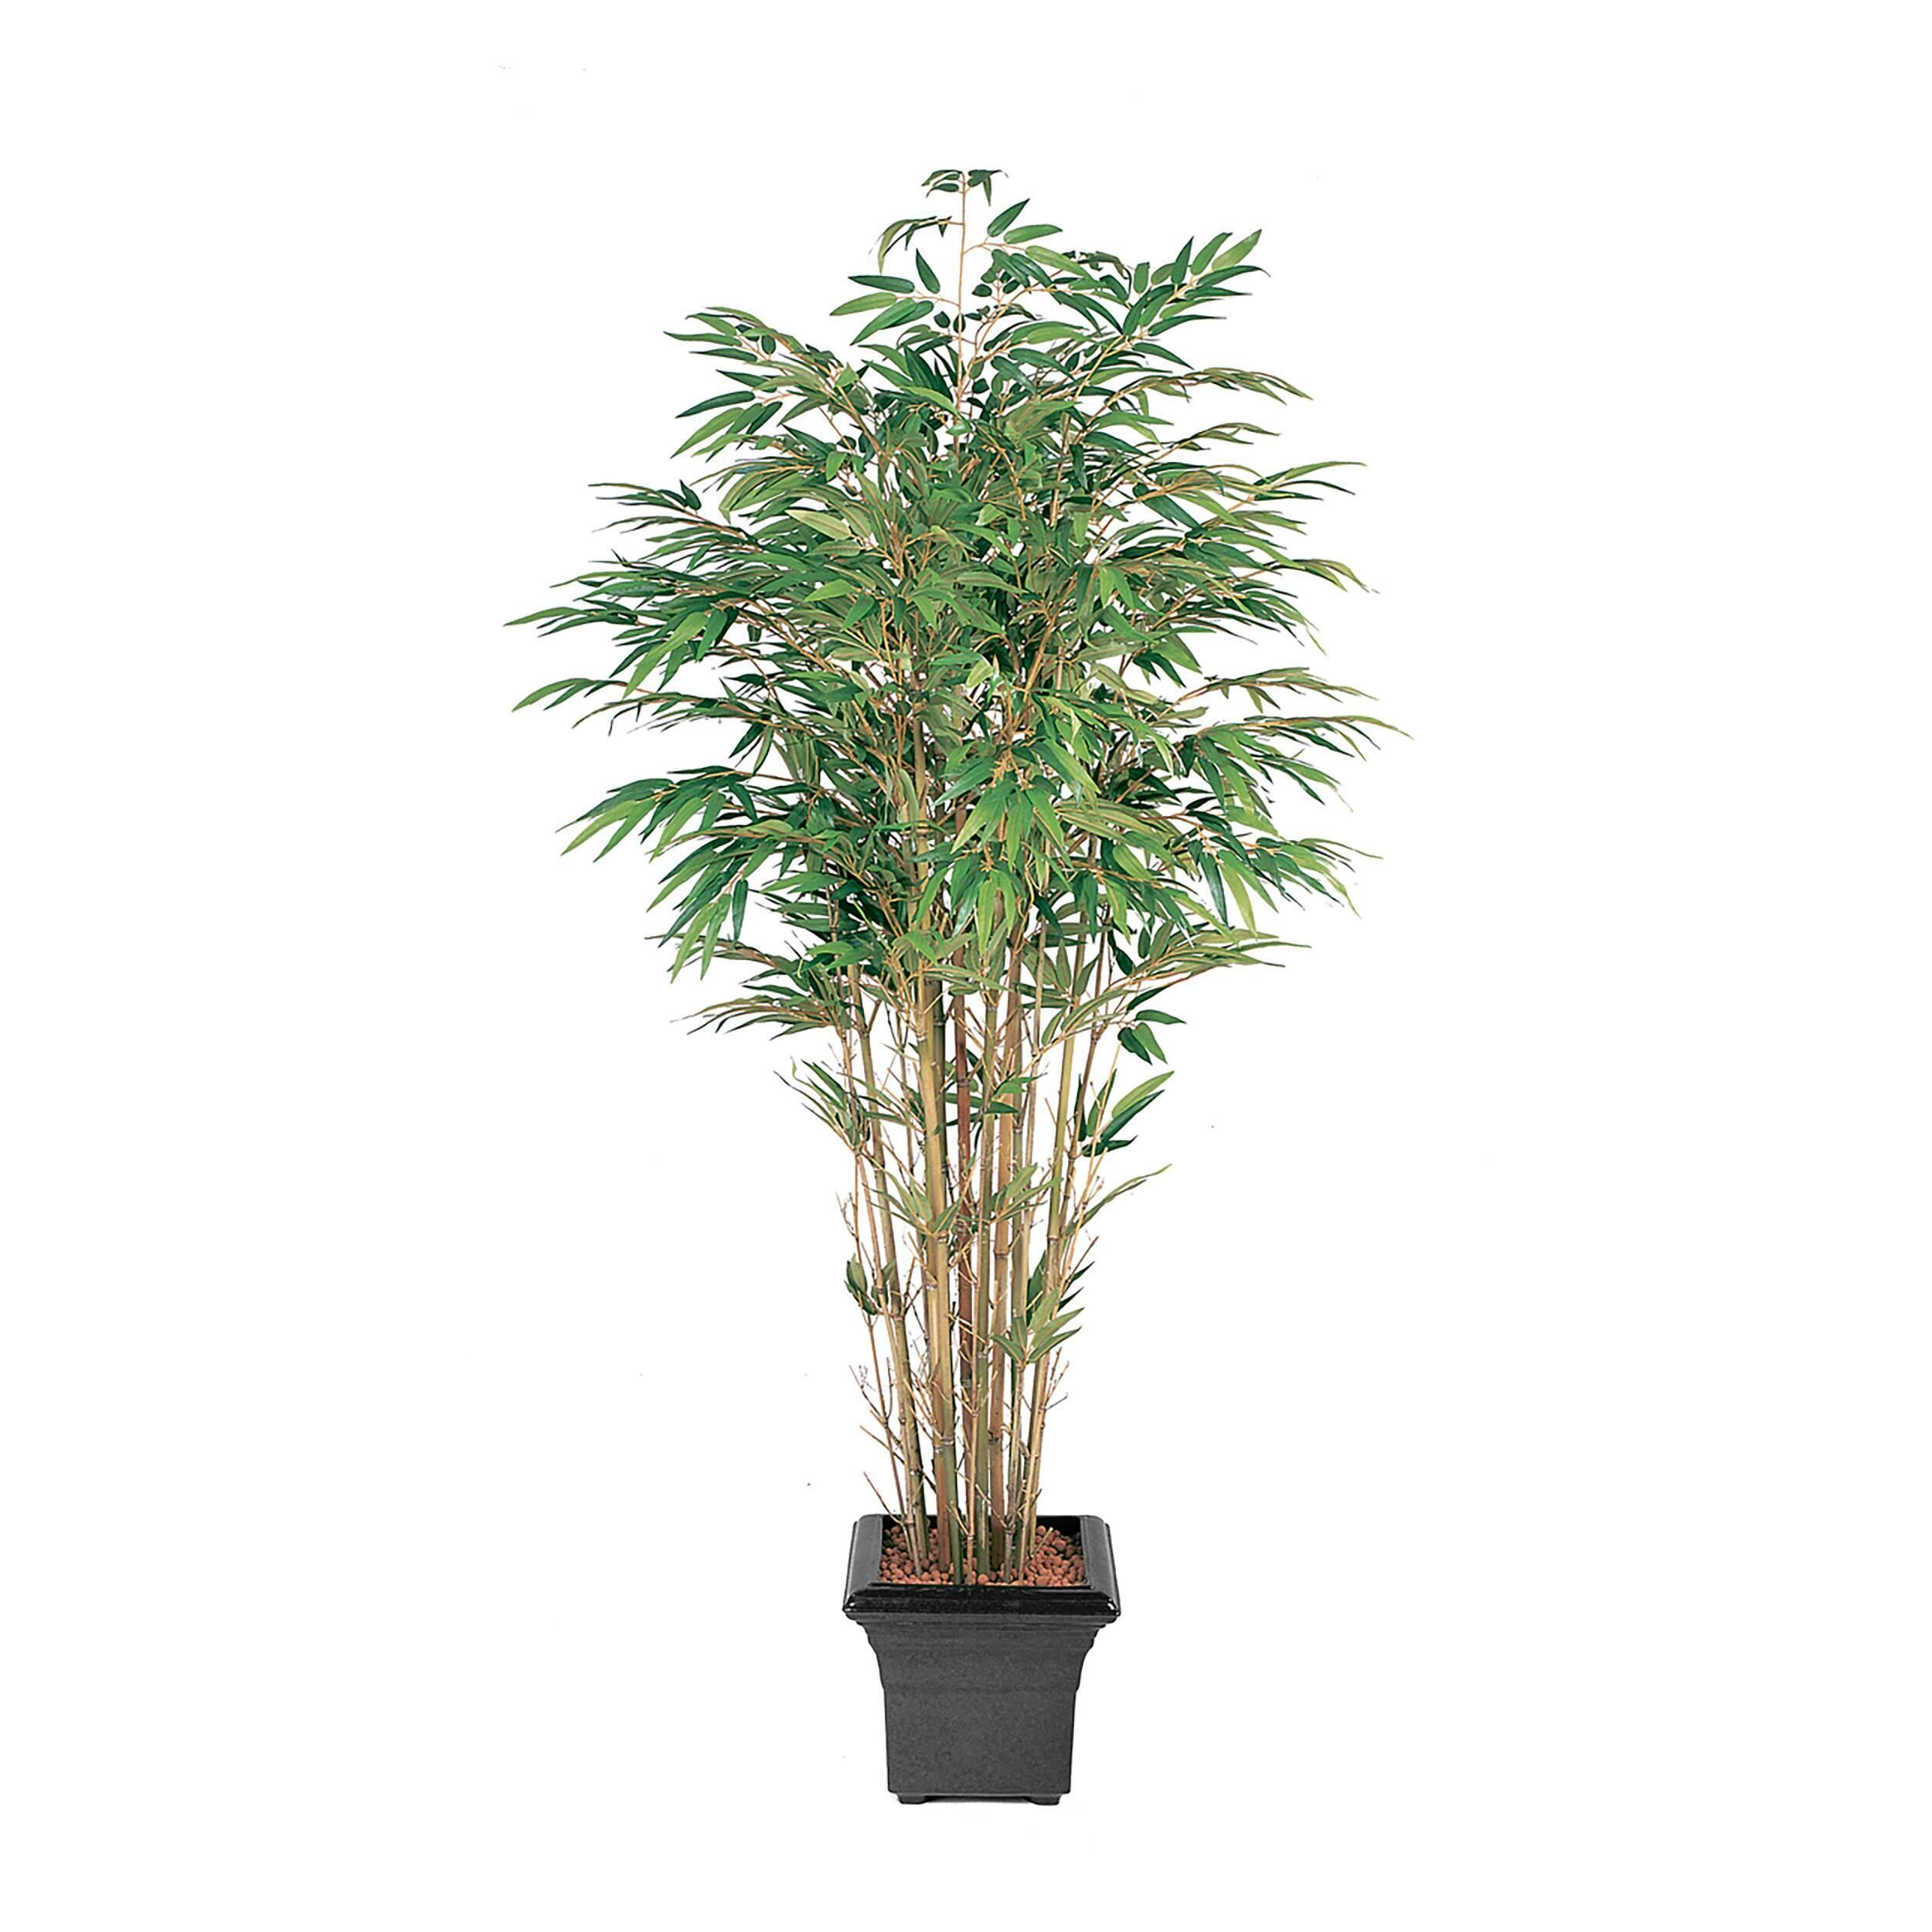 Купить Бамбук натуральный 180 см, COSMO RED, Зеленый, Пластик